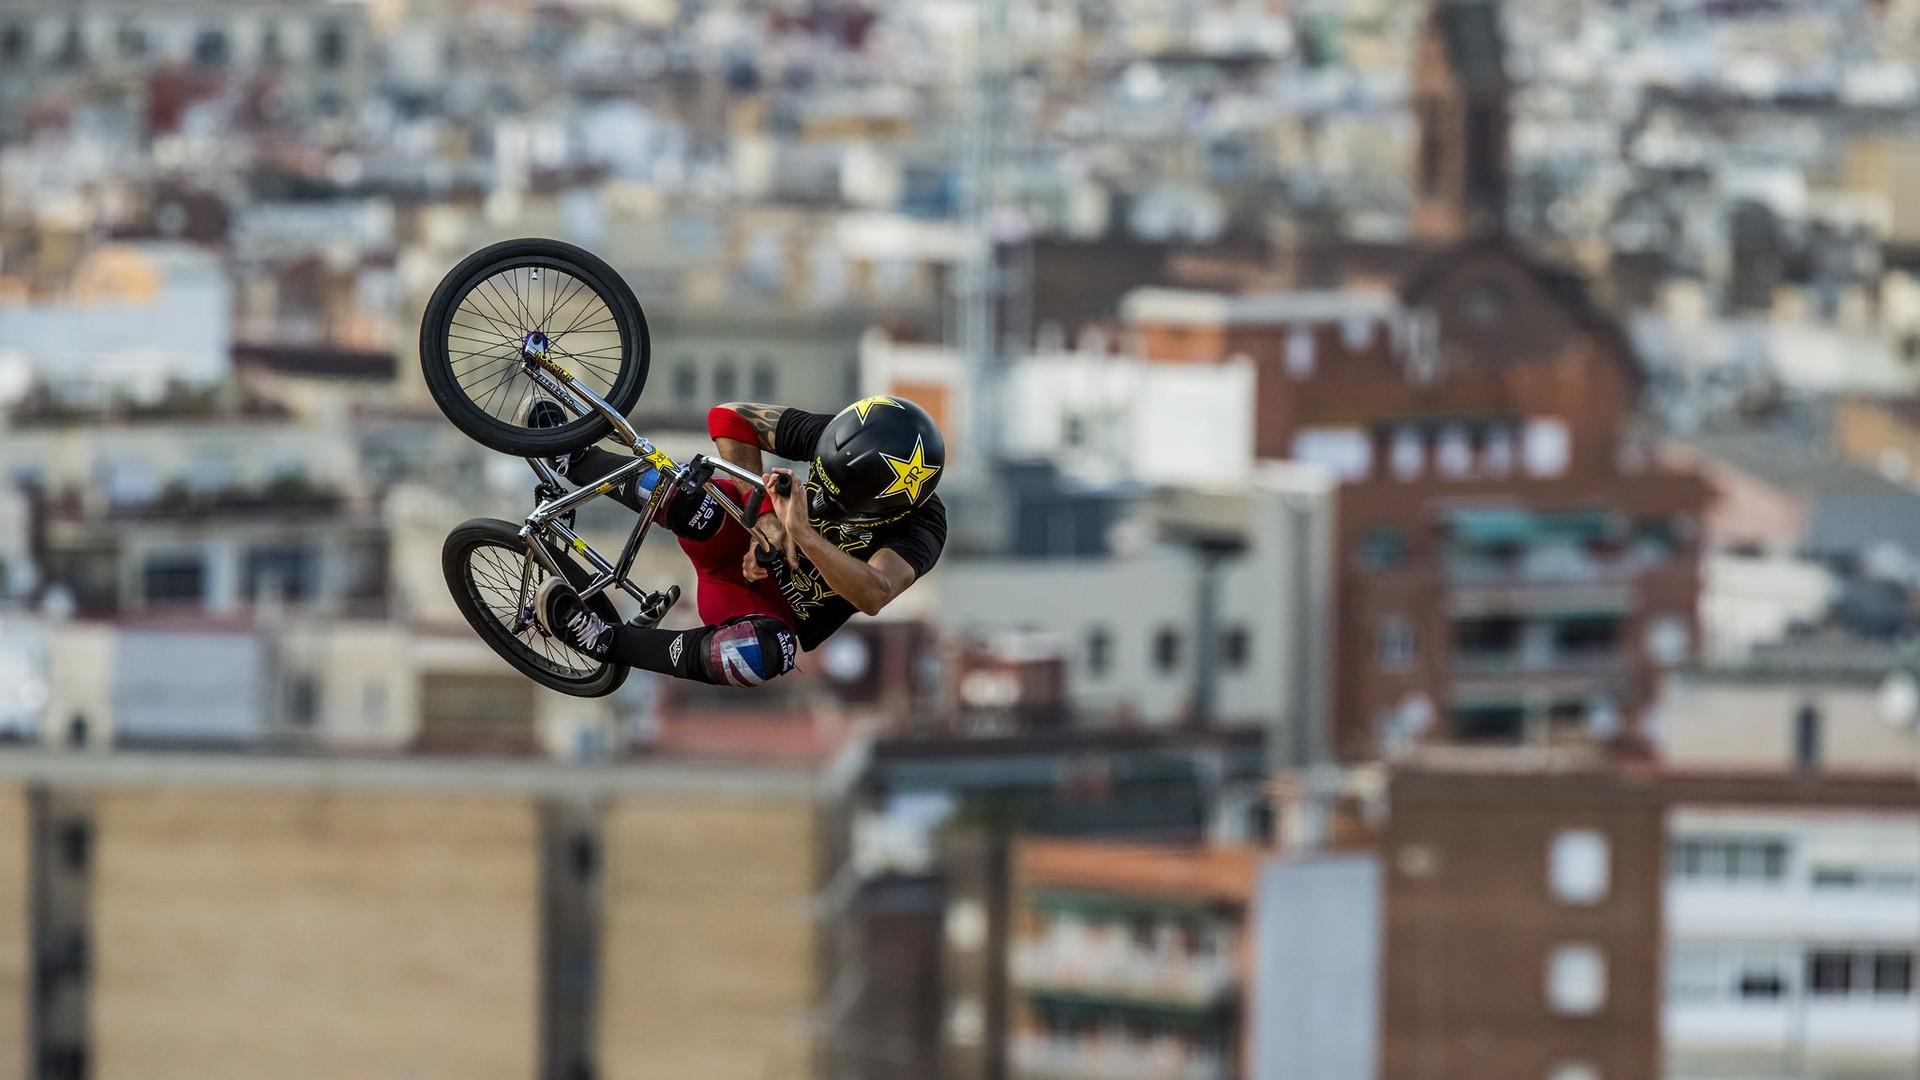 Wallpaper Sports Vehicle Bmx Race Extreme Sport